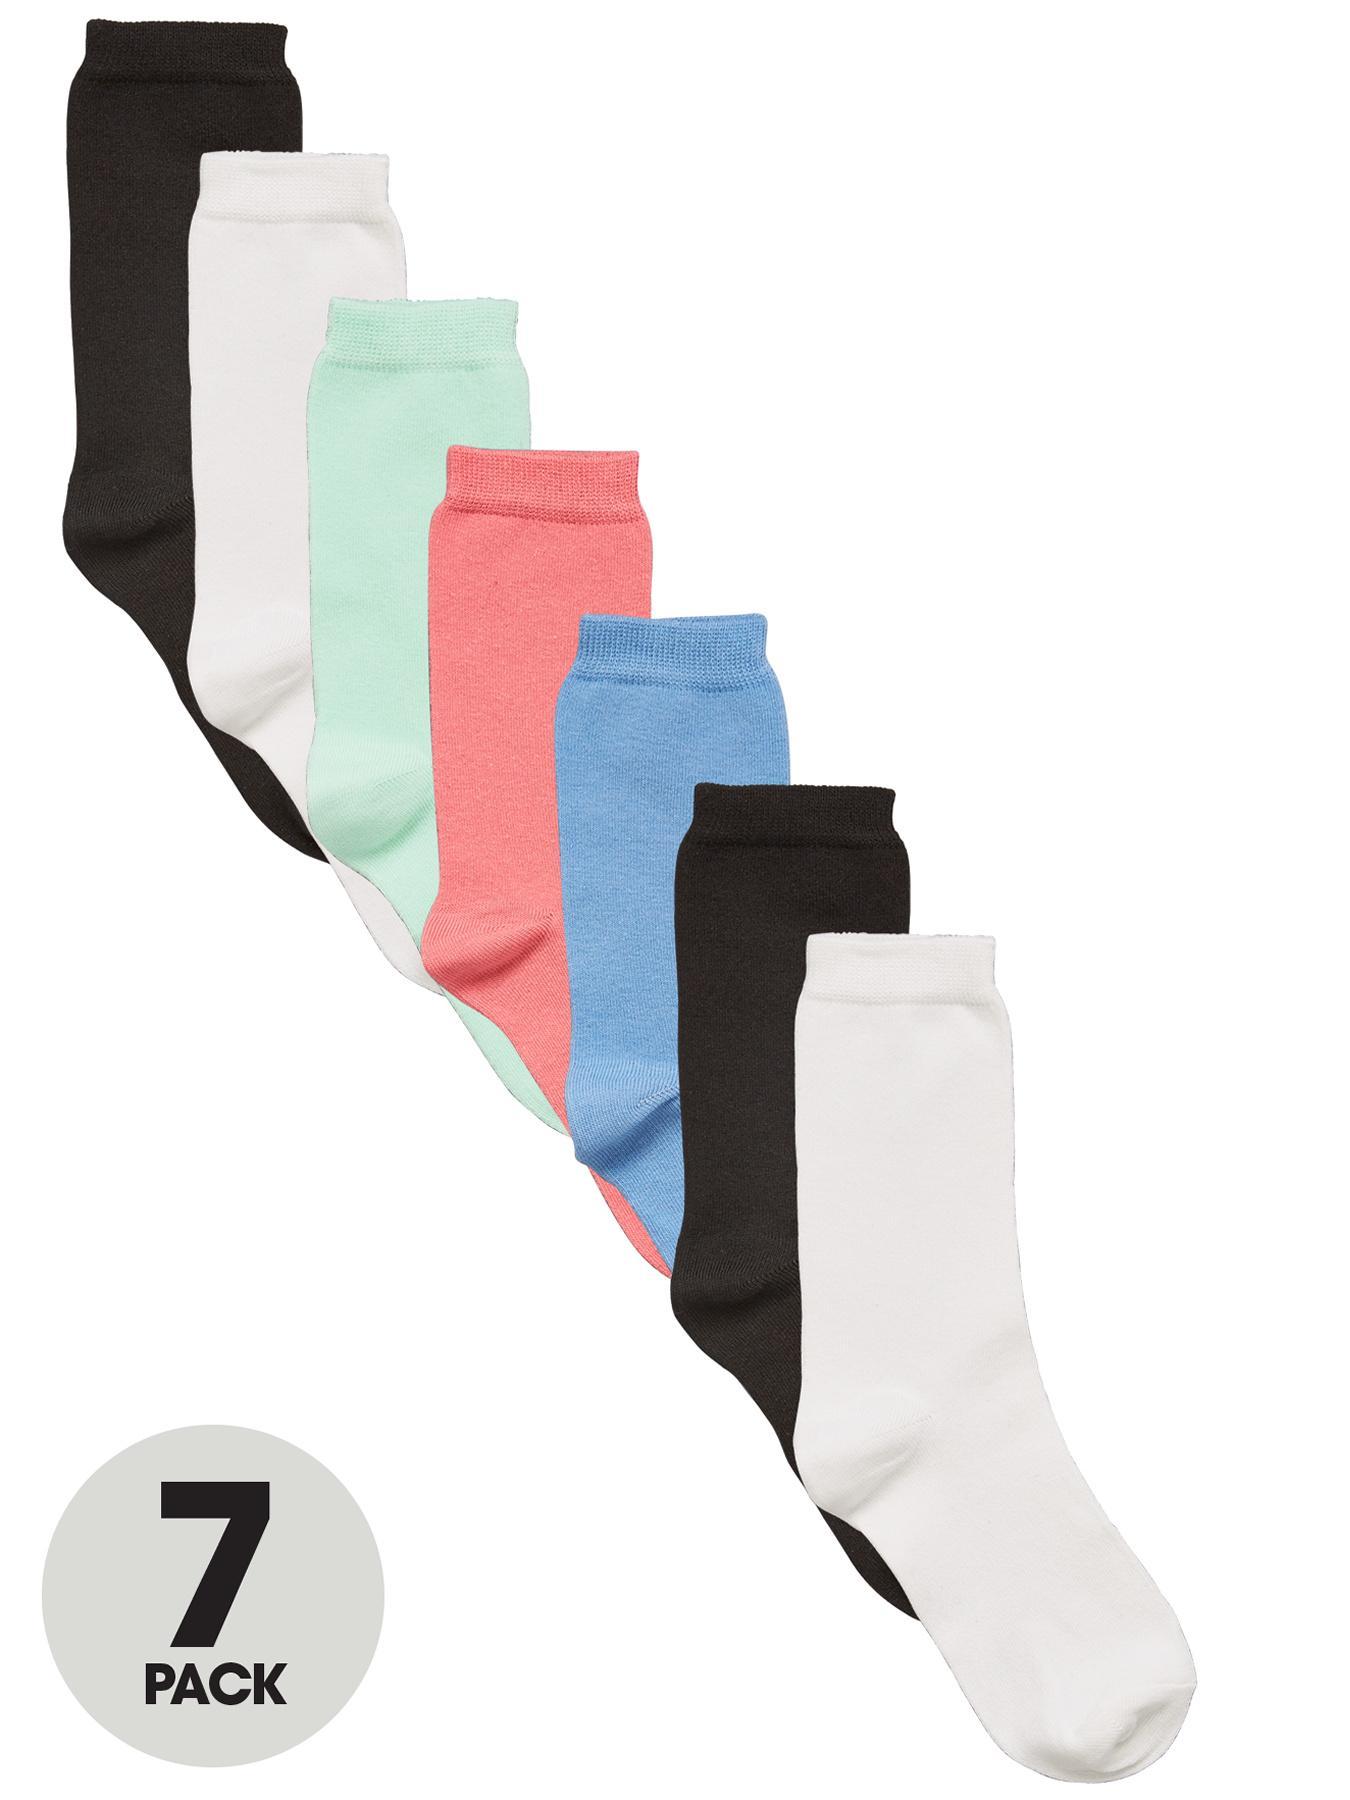 Socks (7 Pack) at Littlewoods